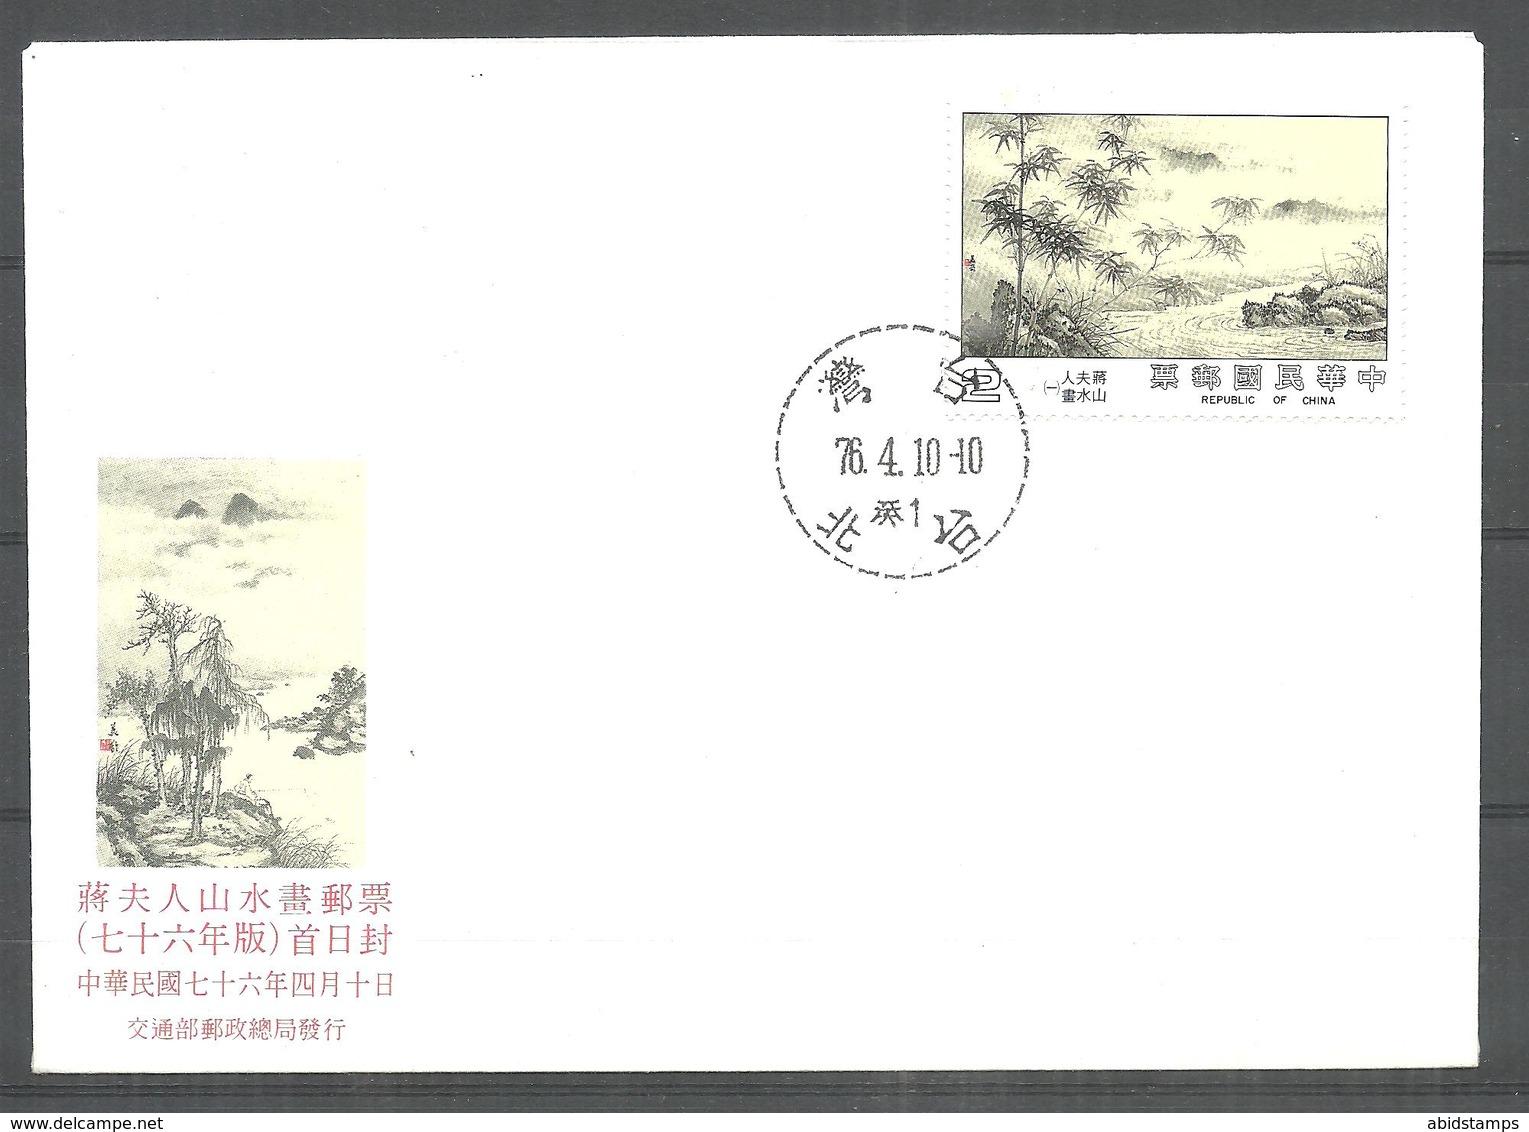 REPUBLIC OF CHINA , TAIWAN FDC 1976 - Taiwan (Formosa)